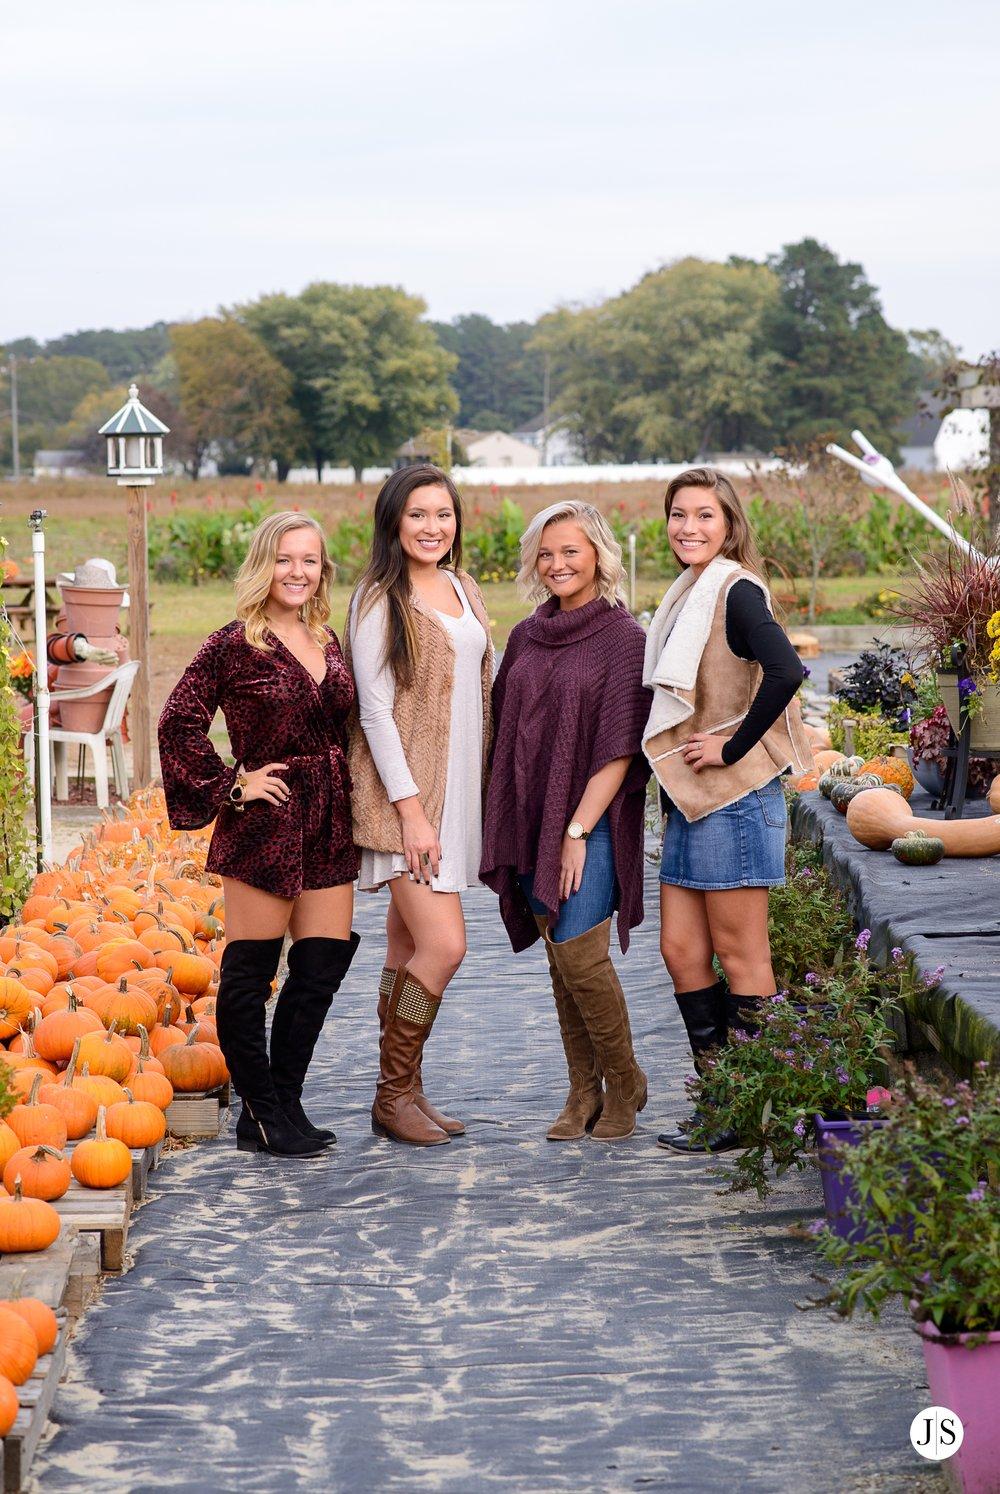 senior-portrait-pumpkins-maryland-adkins-farm-fall-portraits-modelreps-photo 1.jpg